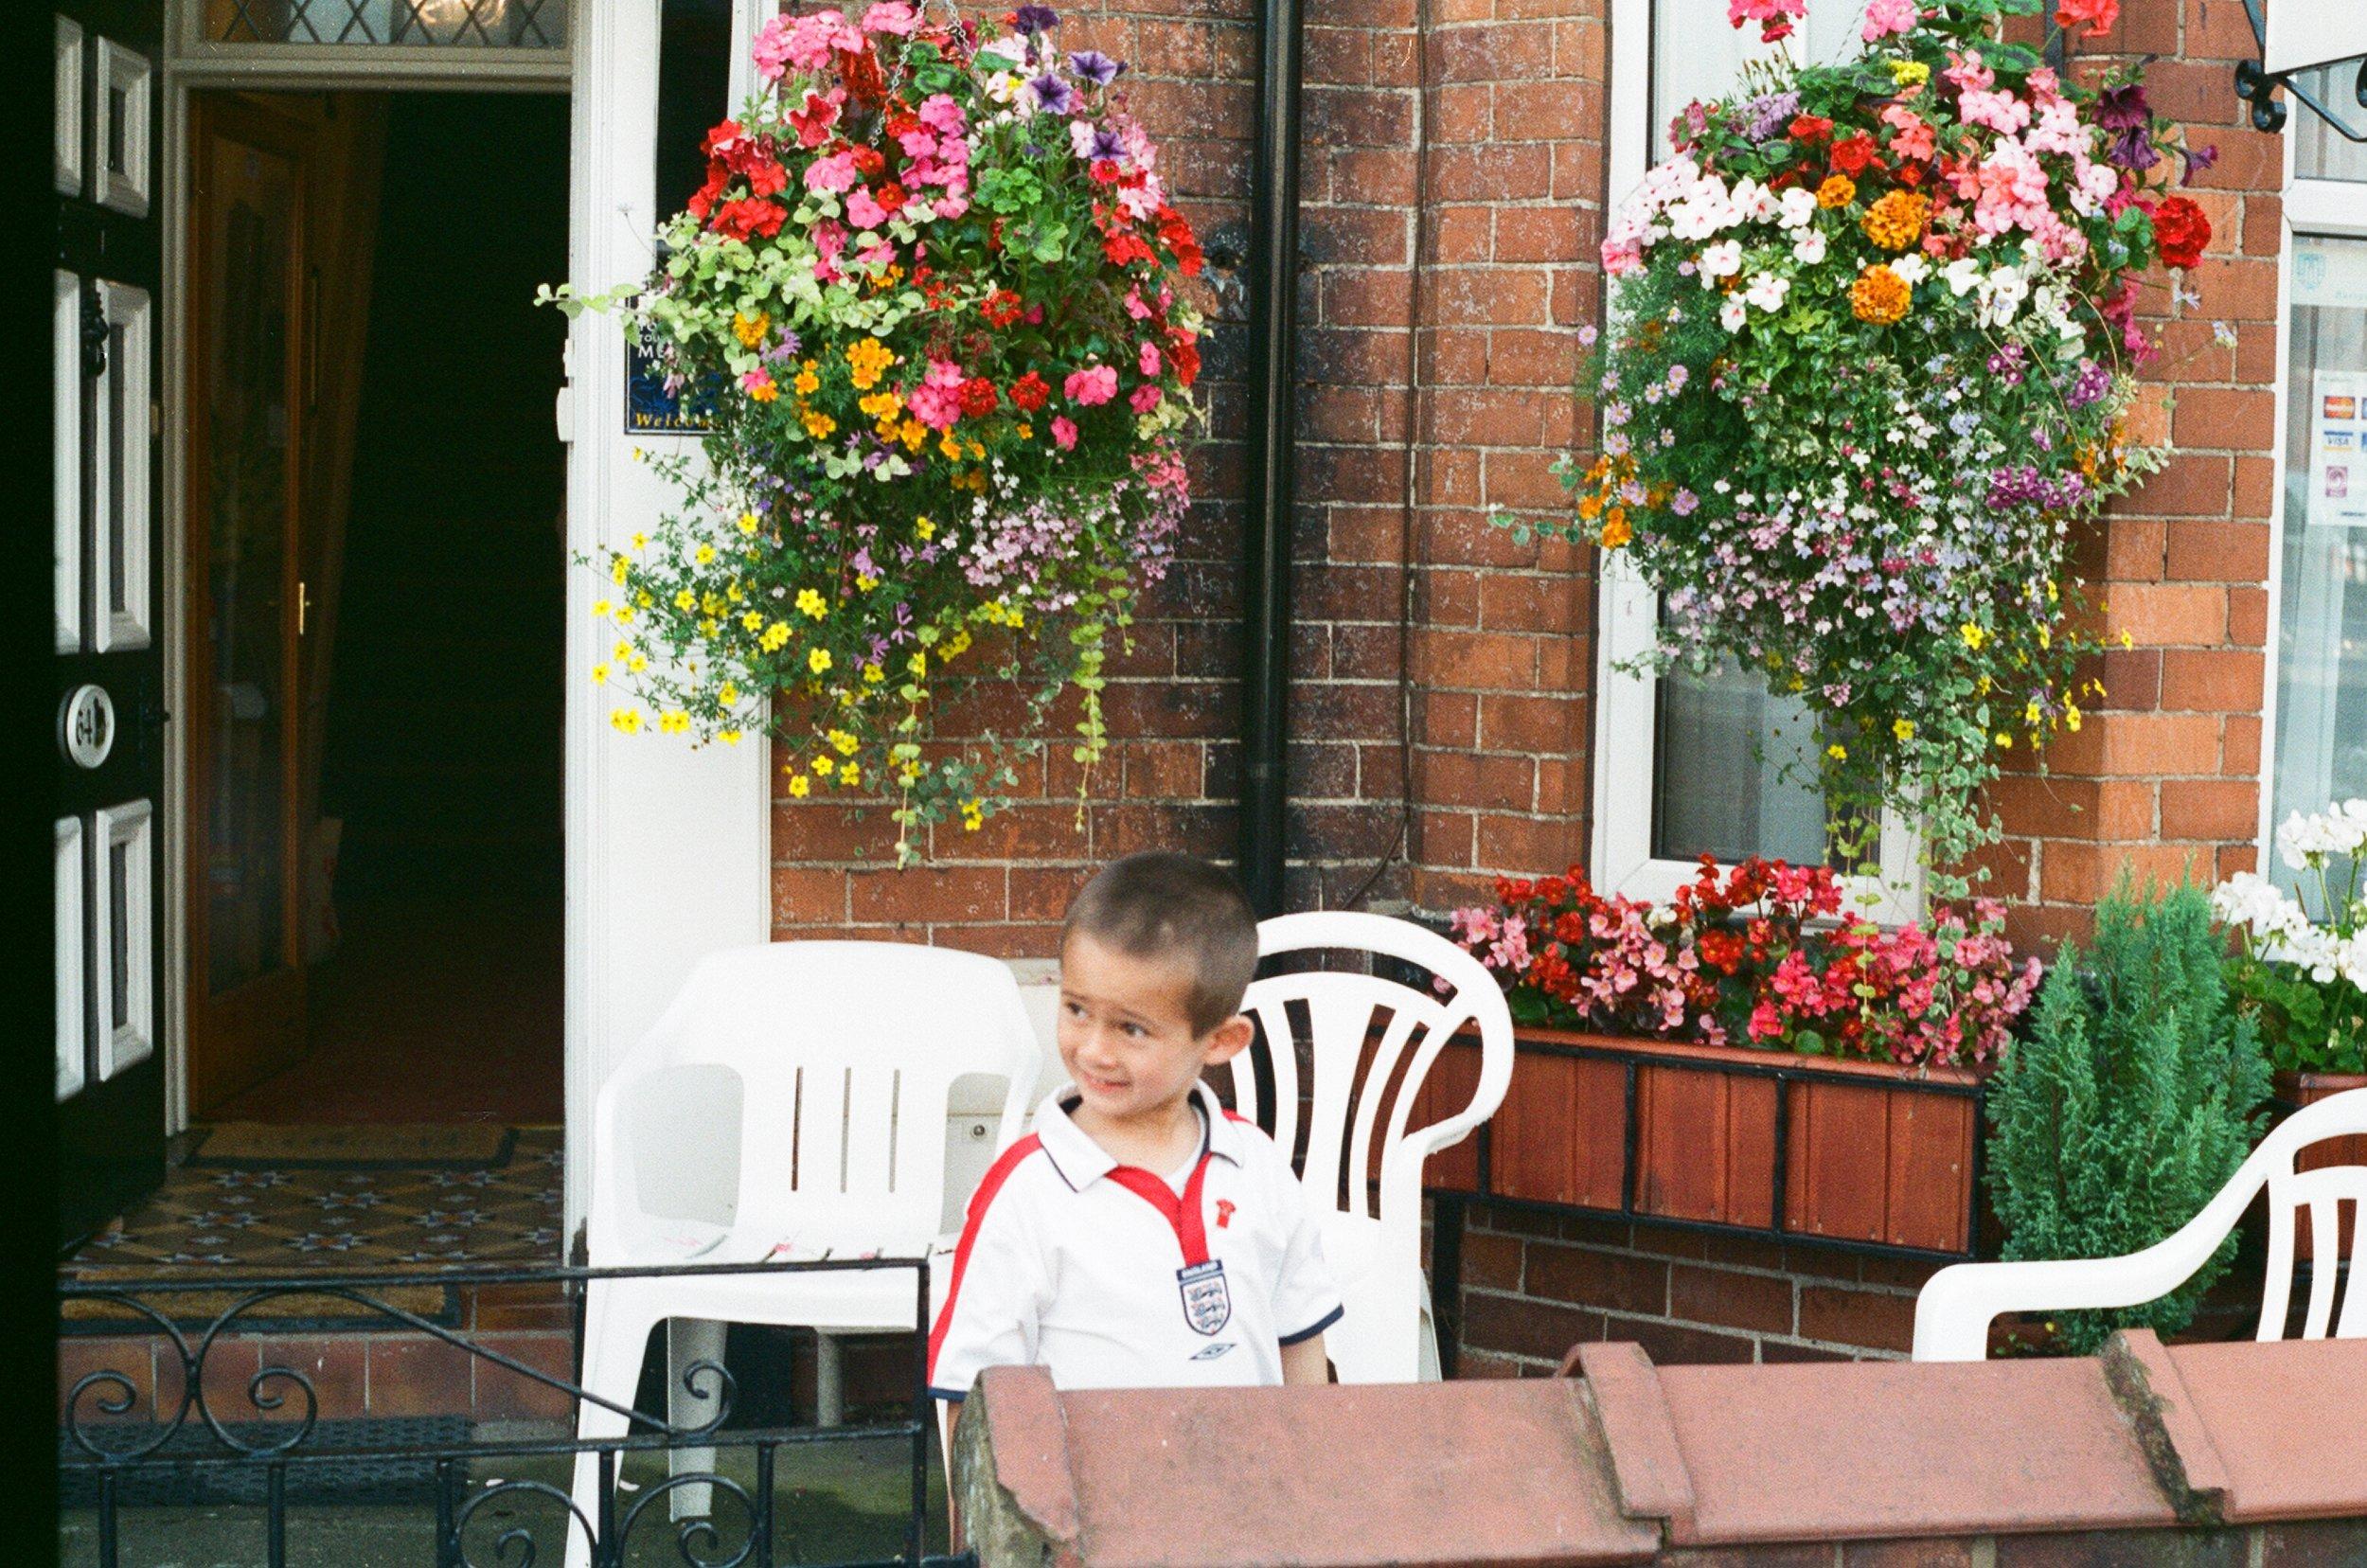 Yorkshire, 2004